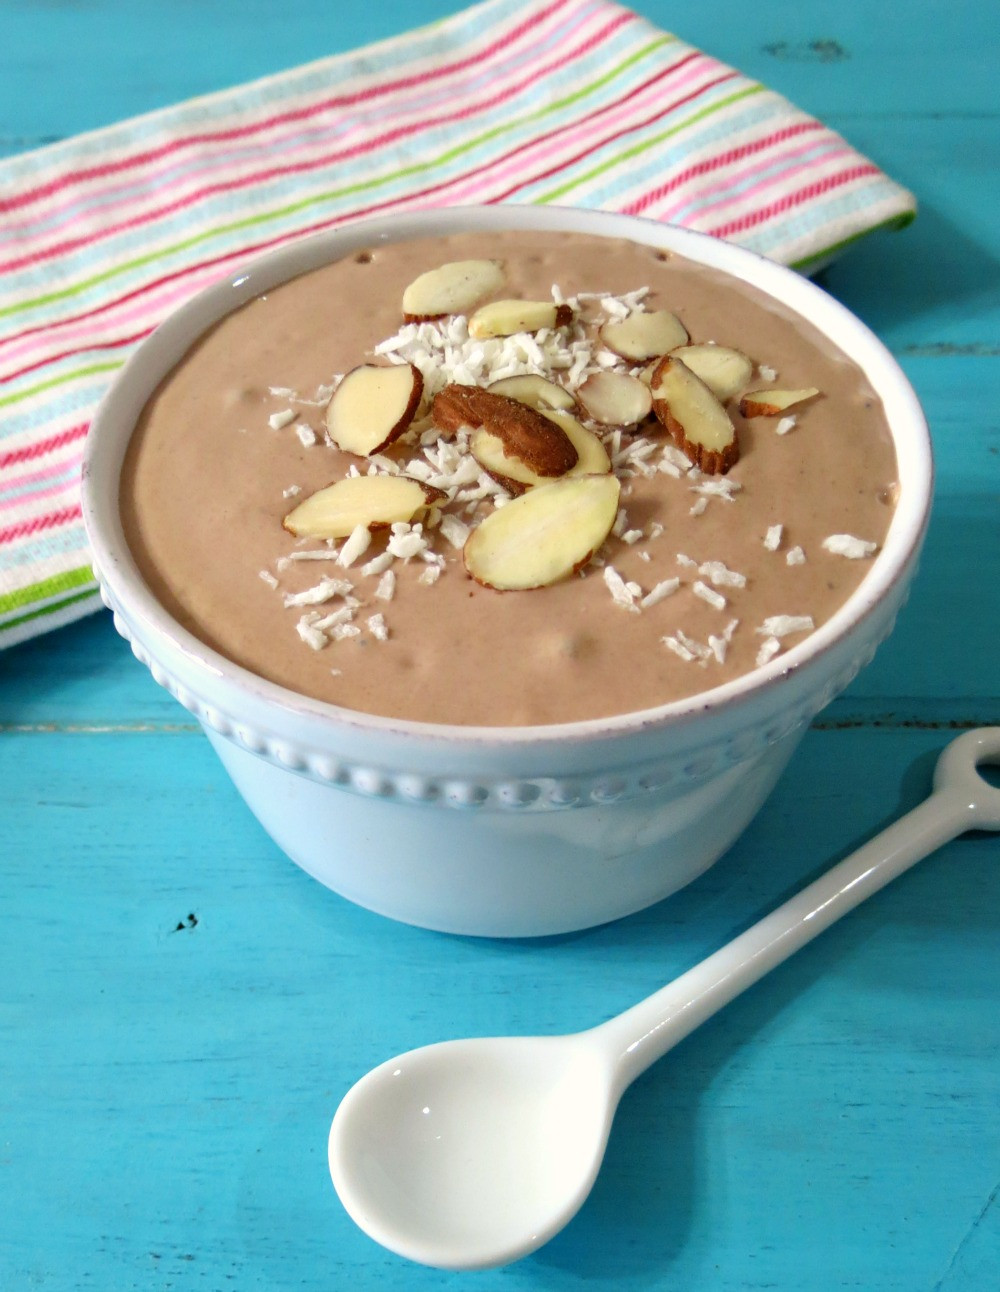 Almond-Joy-Breakfast-Smoothie-Bowl-004a.jpg